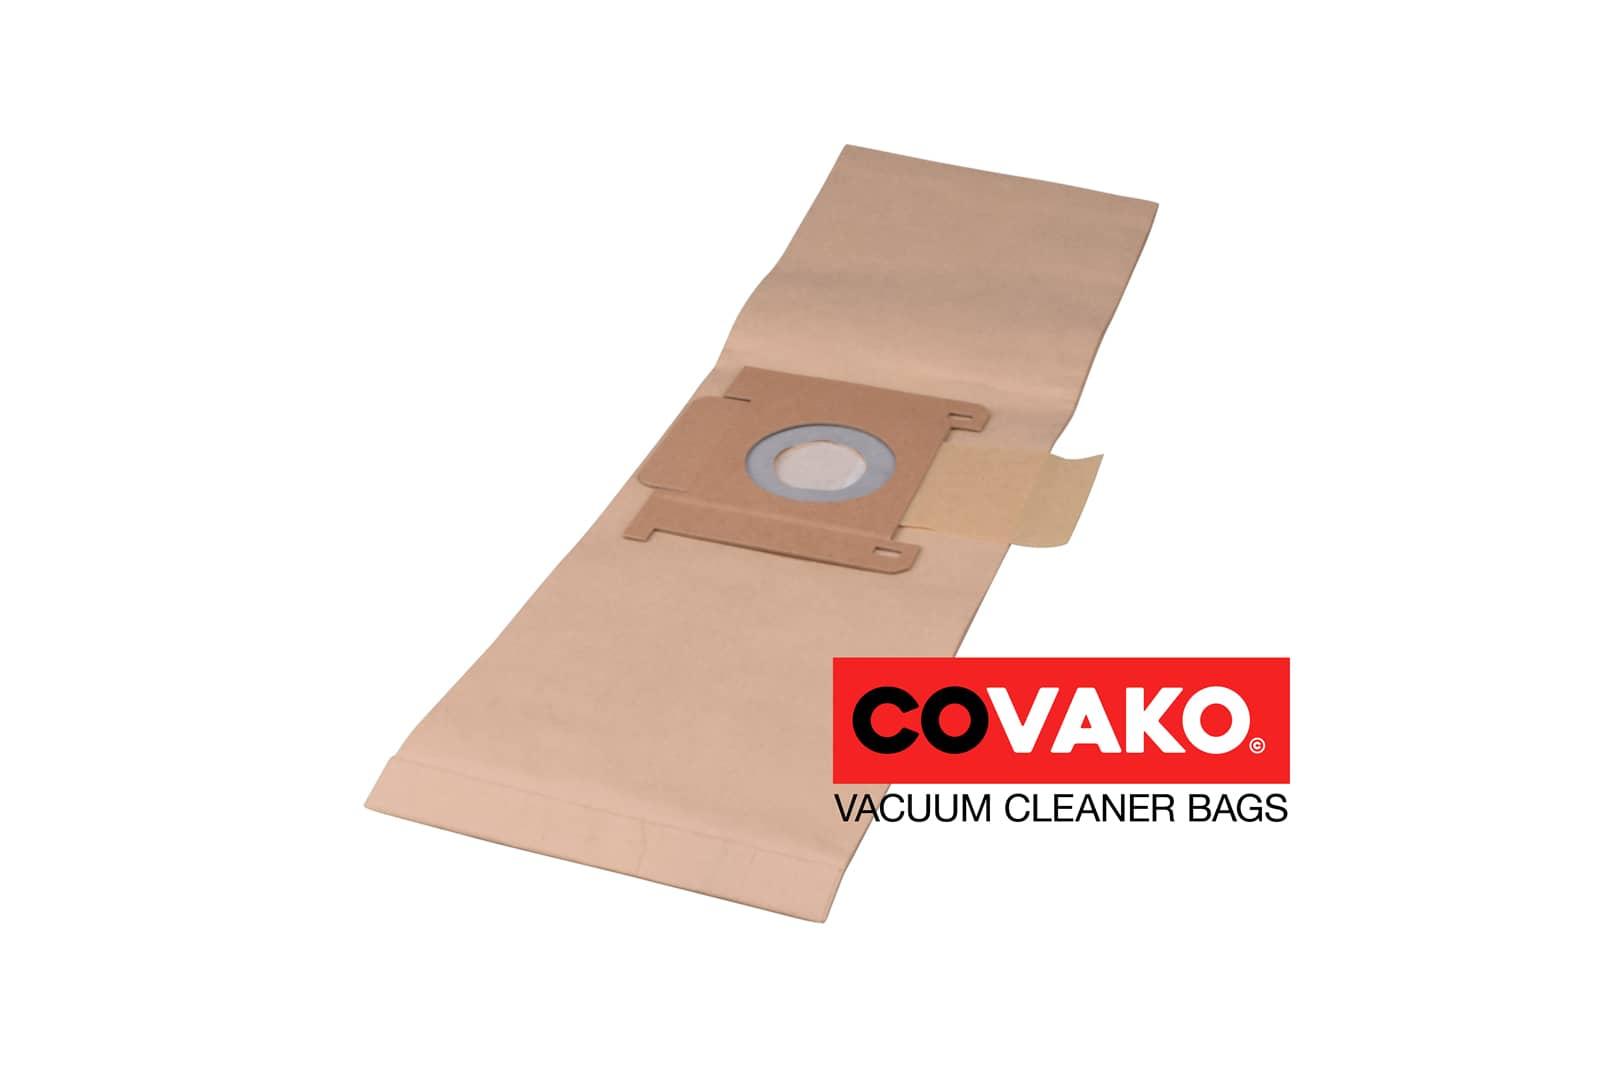 Lorito C 5 / Paper - Lorito vacuum cleaner bags